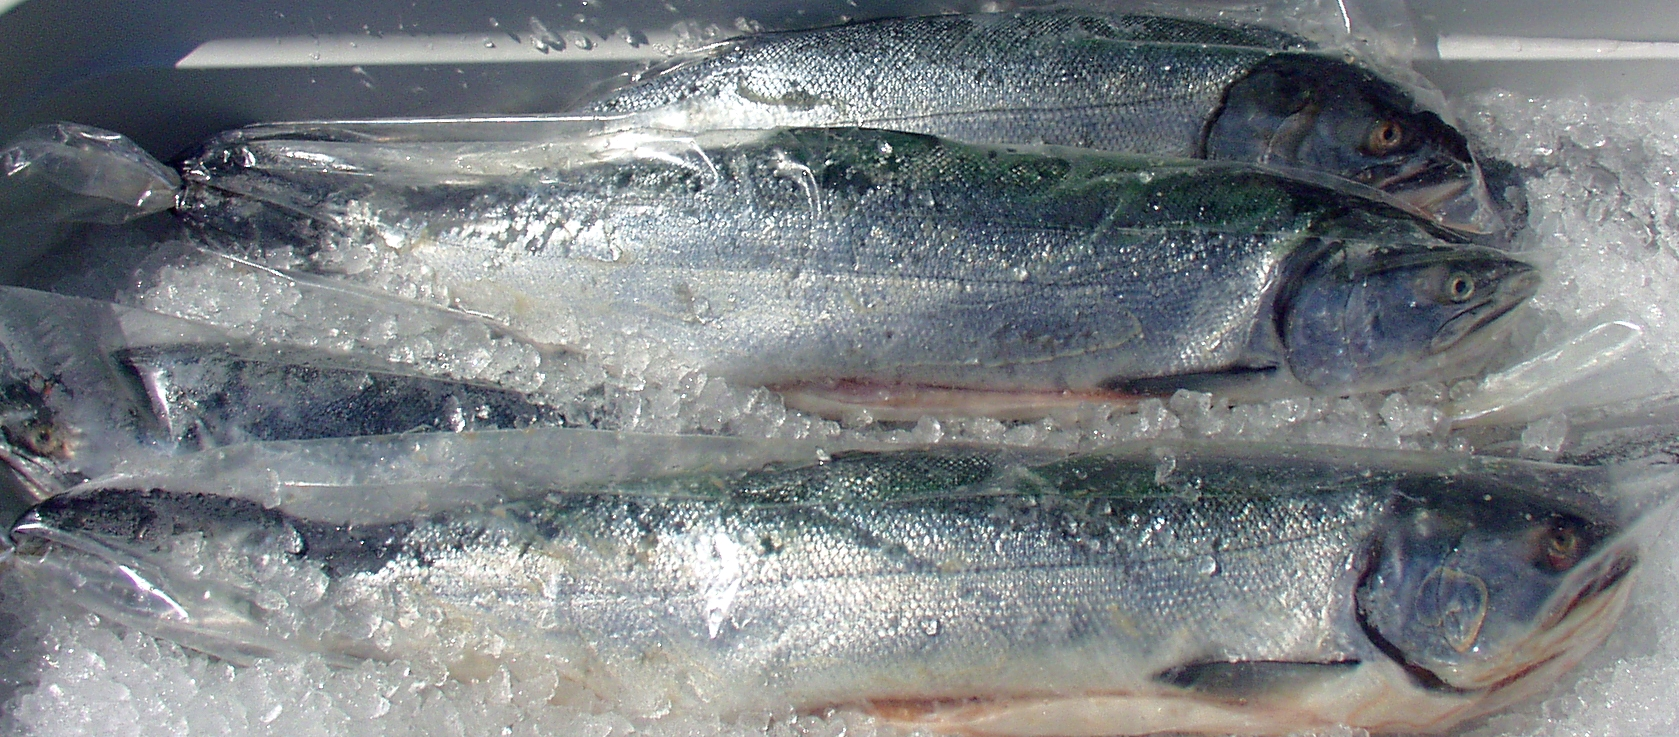 Fresh, whole coho salmon from Wilson Fish. Photo copyright 2009 by Zachary D. Lyons.